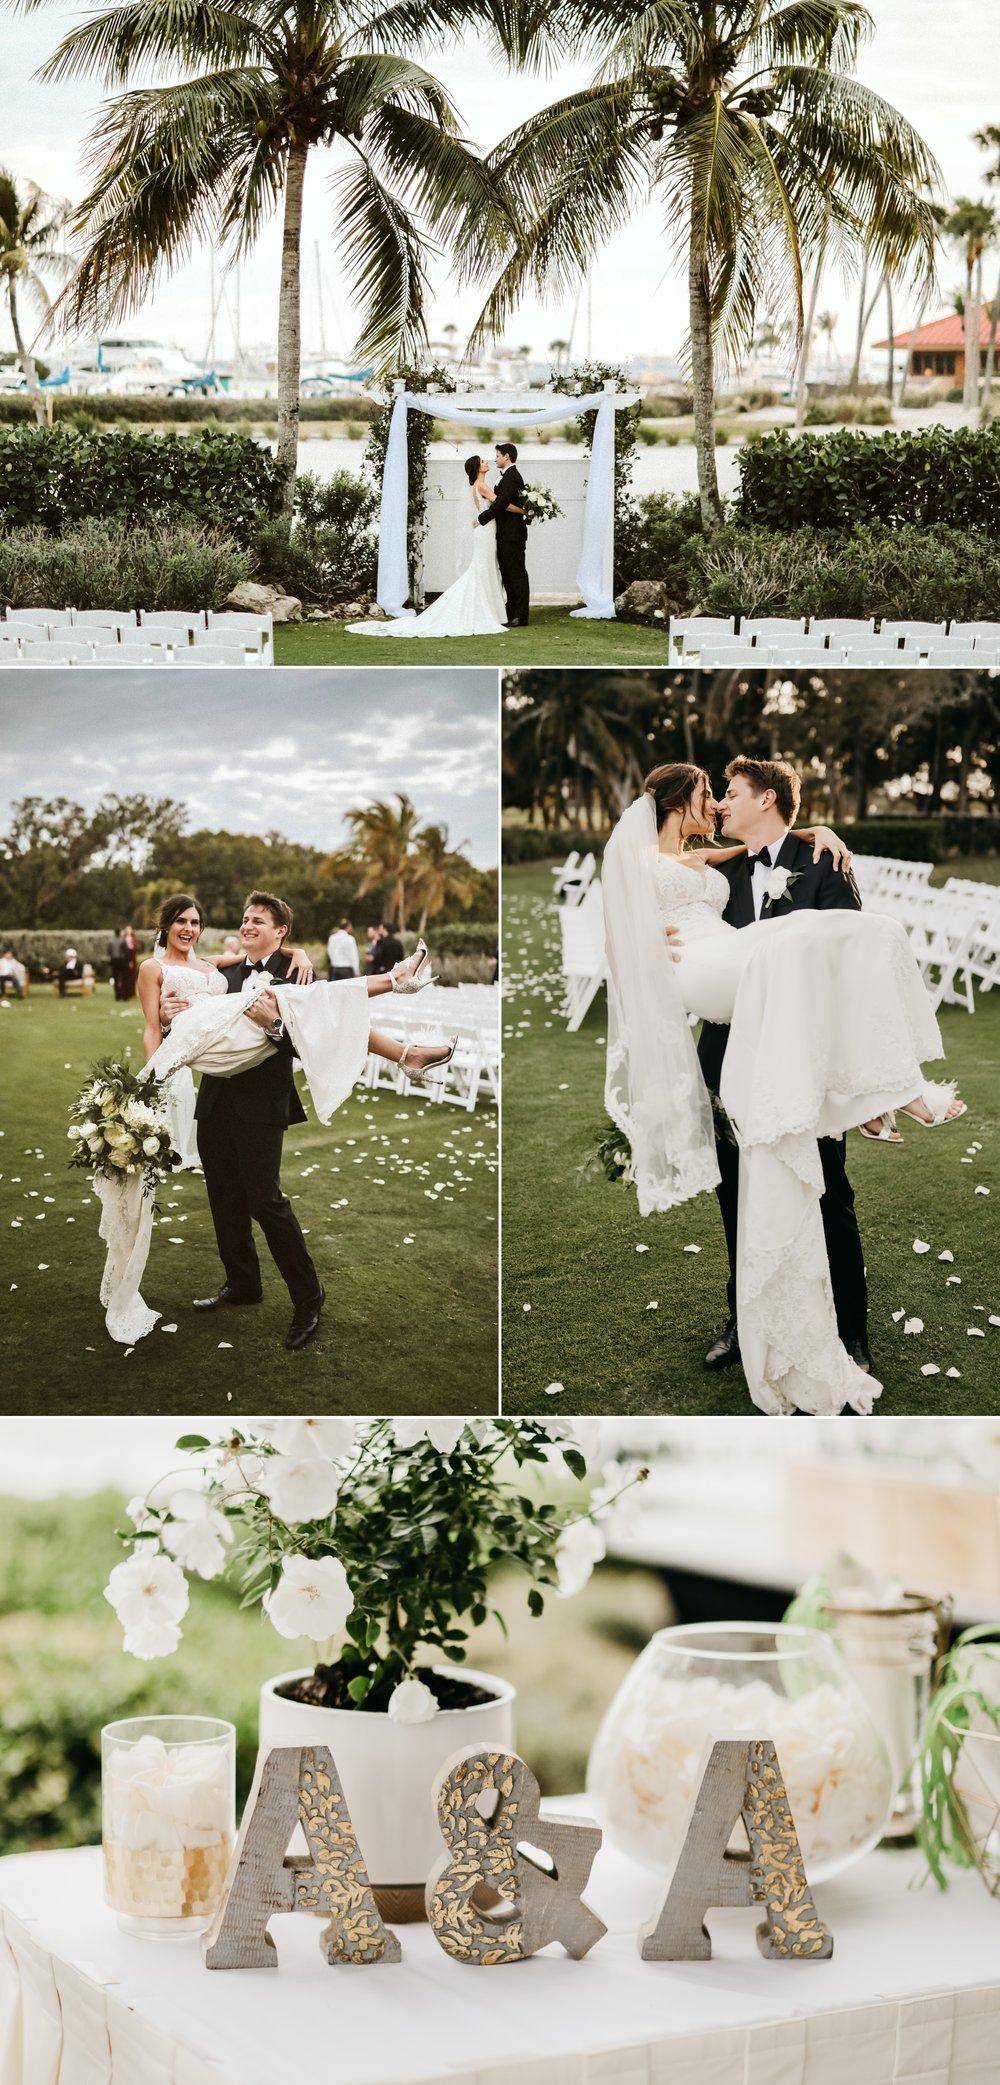 Luxe_tropical_travel_destination_wedding_photography_ShainaDeCiryan.com24.jpg